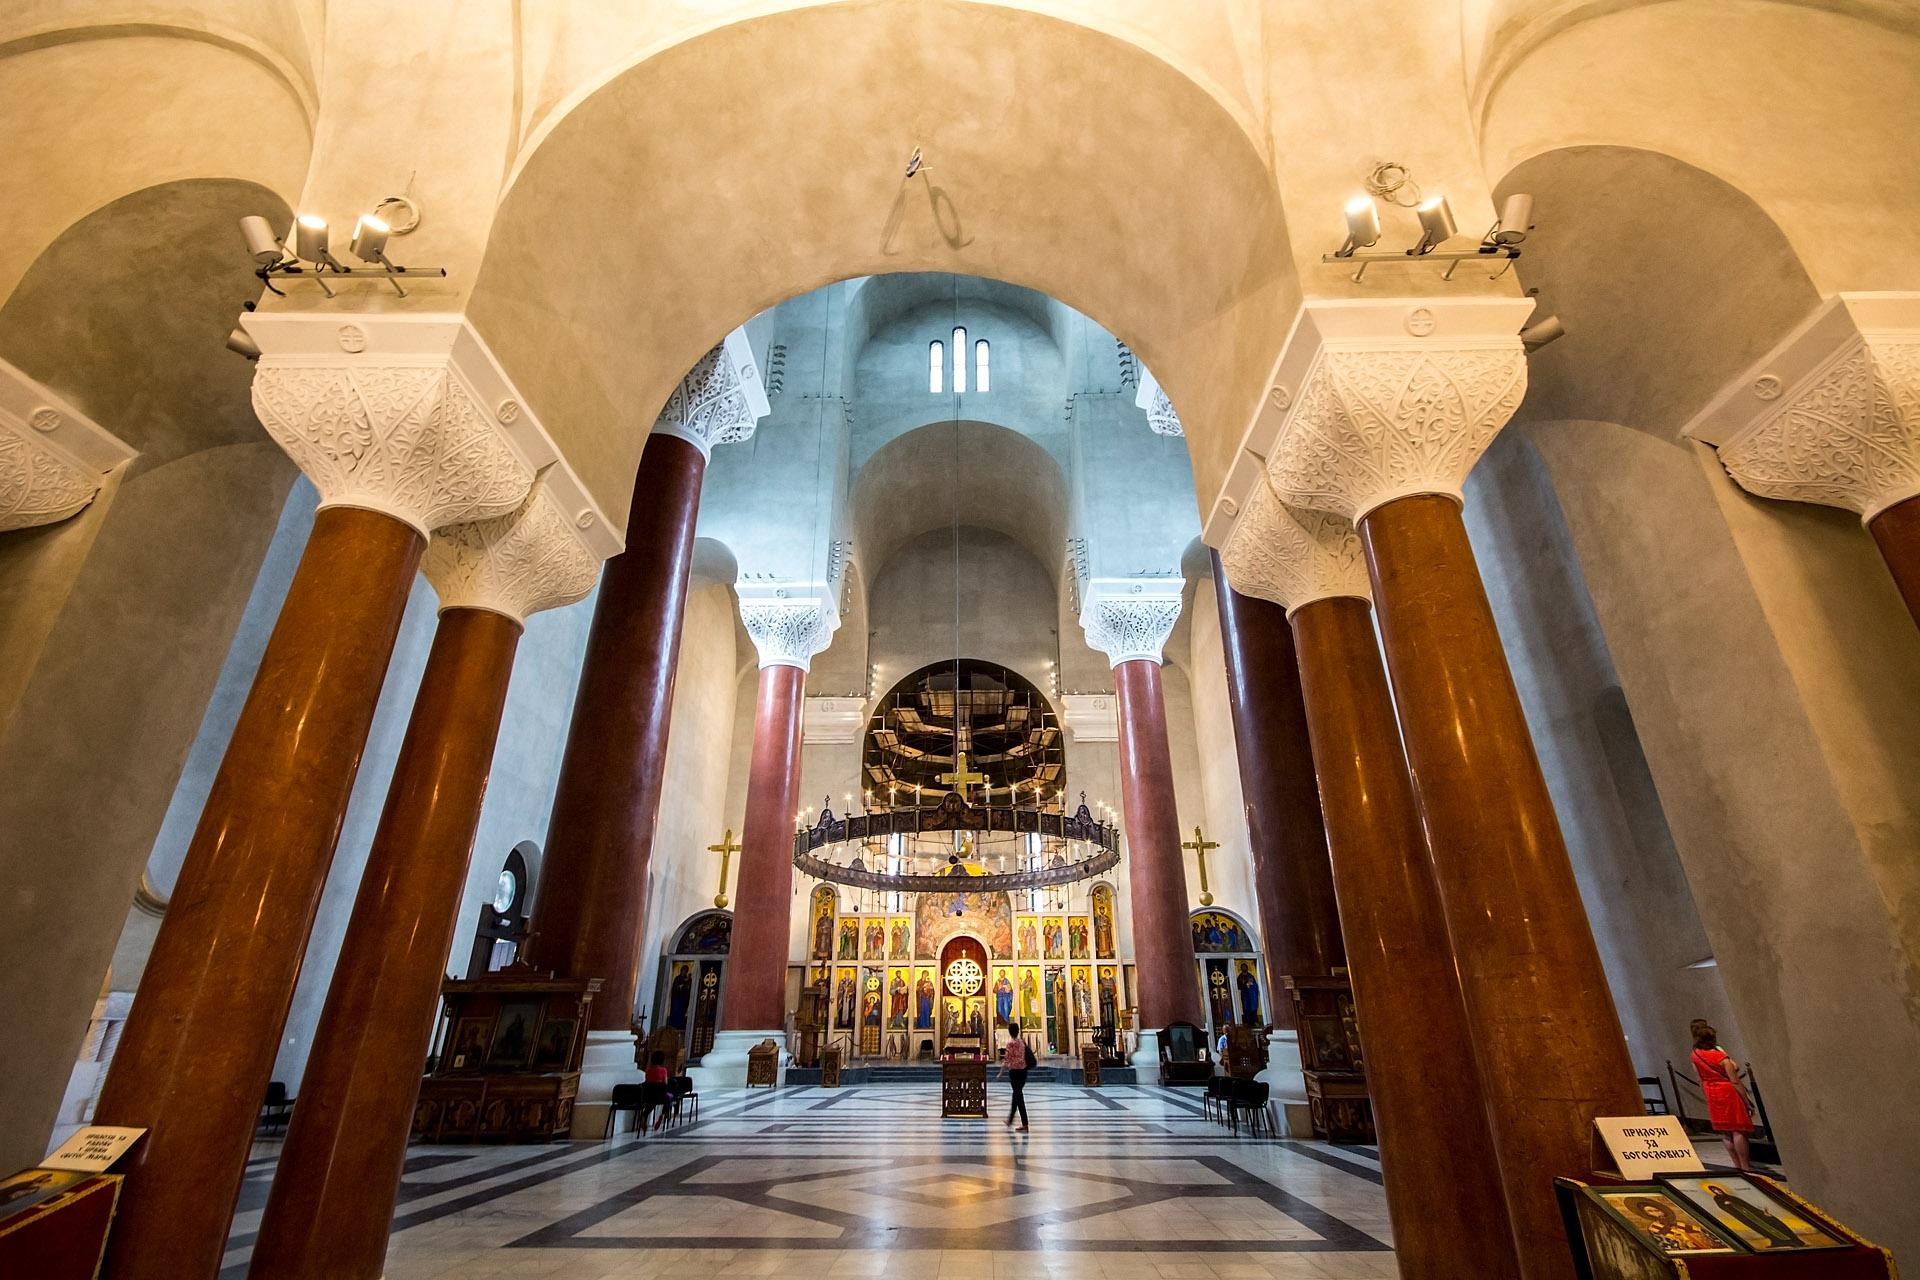 St. Mark's (interior)